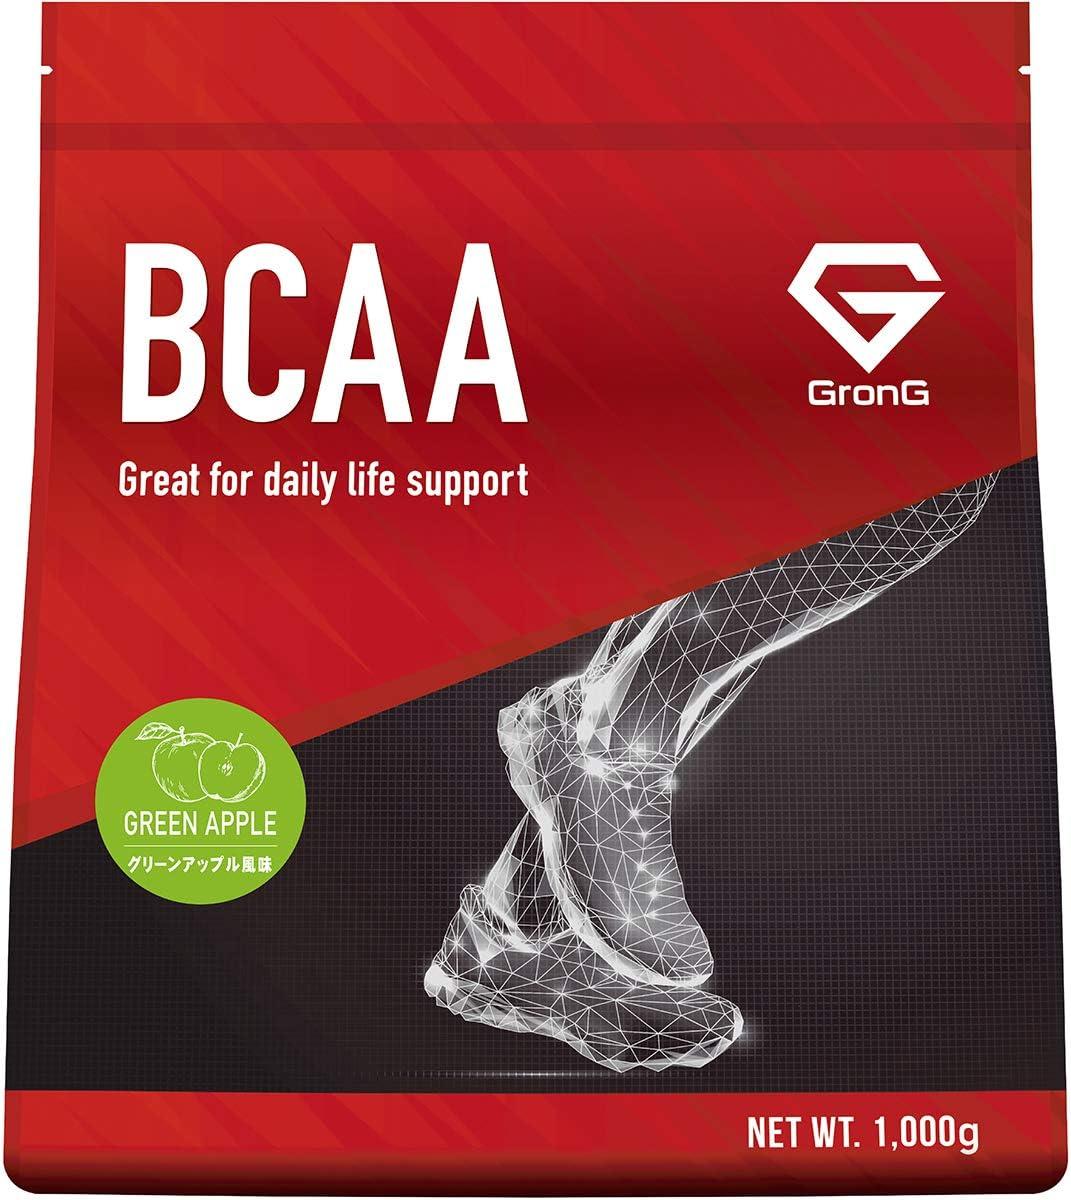 <br /> GronG(グロング) BCAA 必須アミノ酸 グリーンアップル風味 1kg